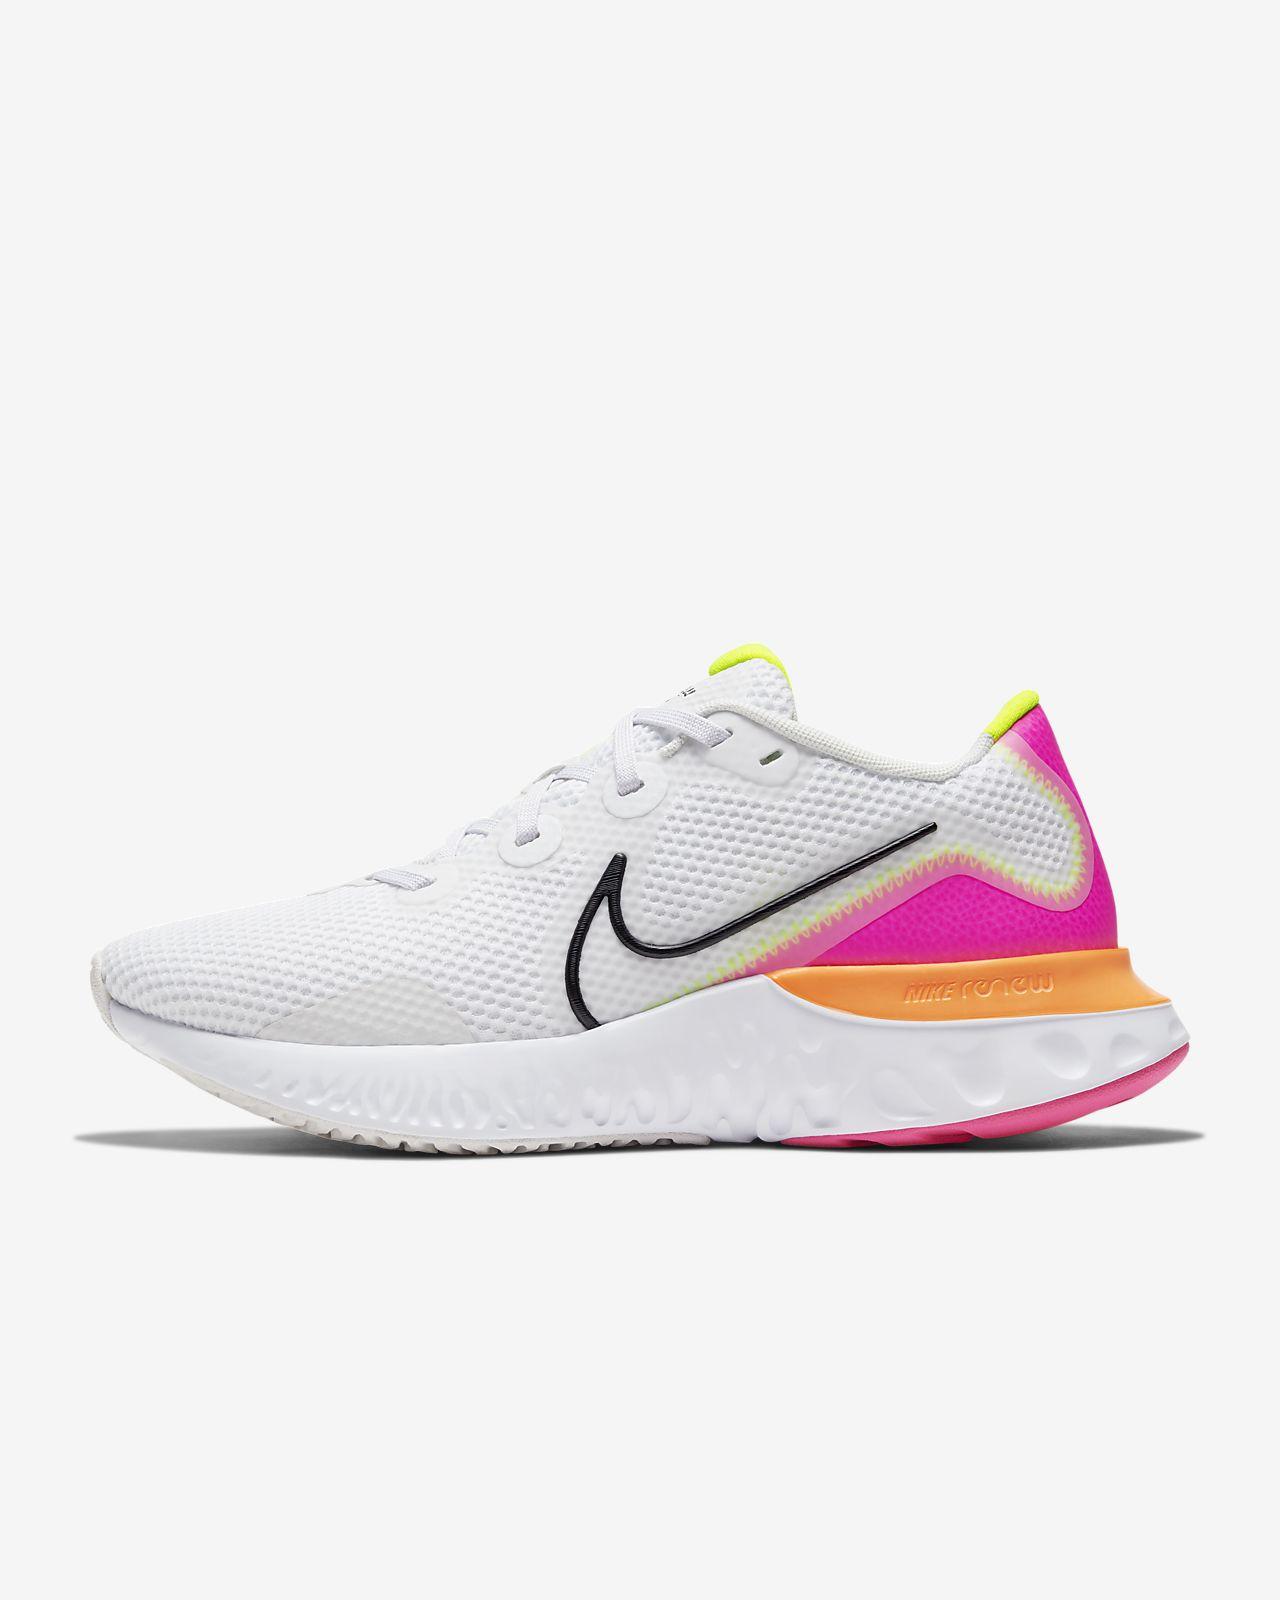 Scarpe da corsa 2016 Nike Downshifter 6 Wolf GrigioBianco